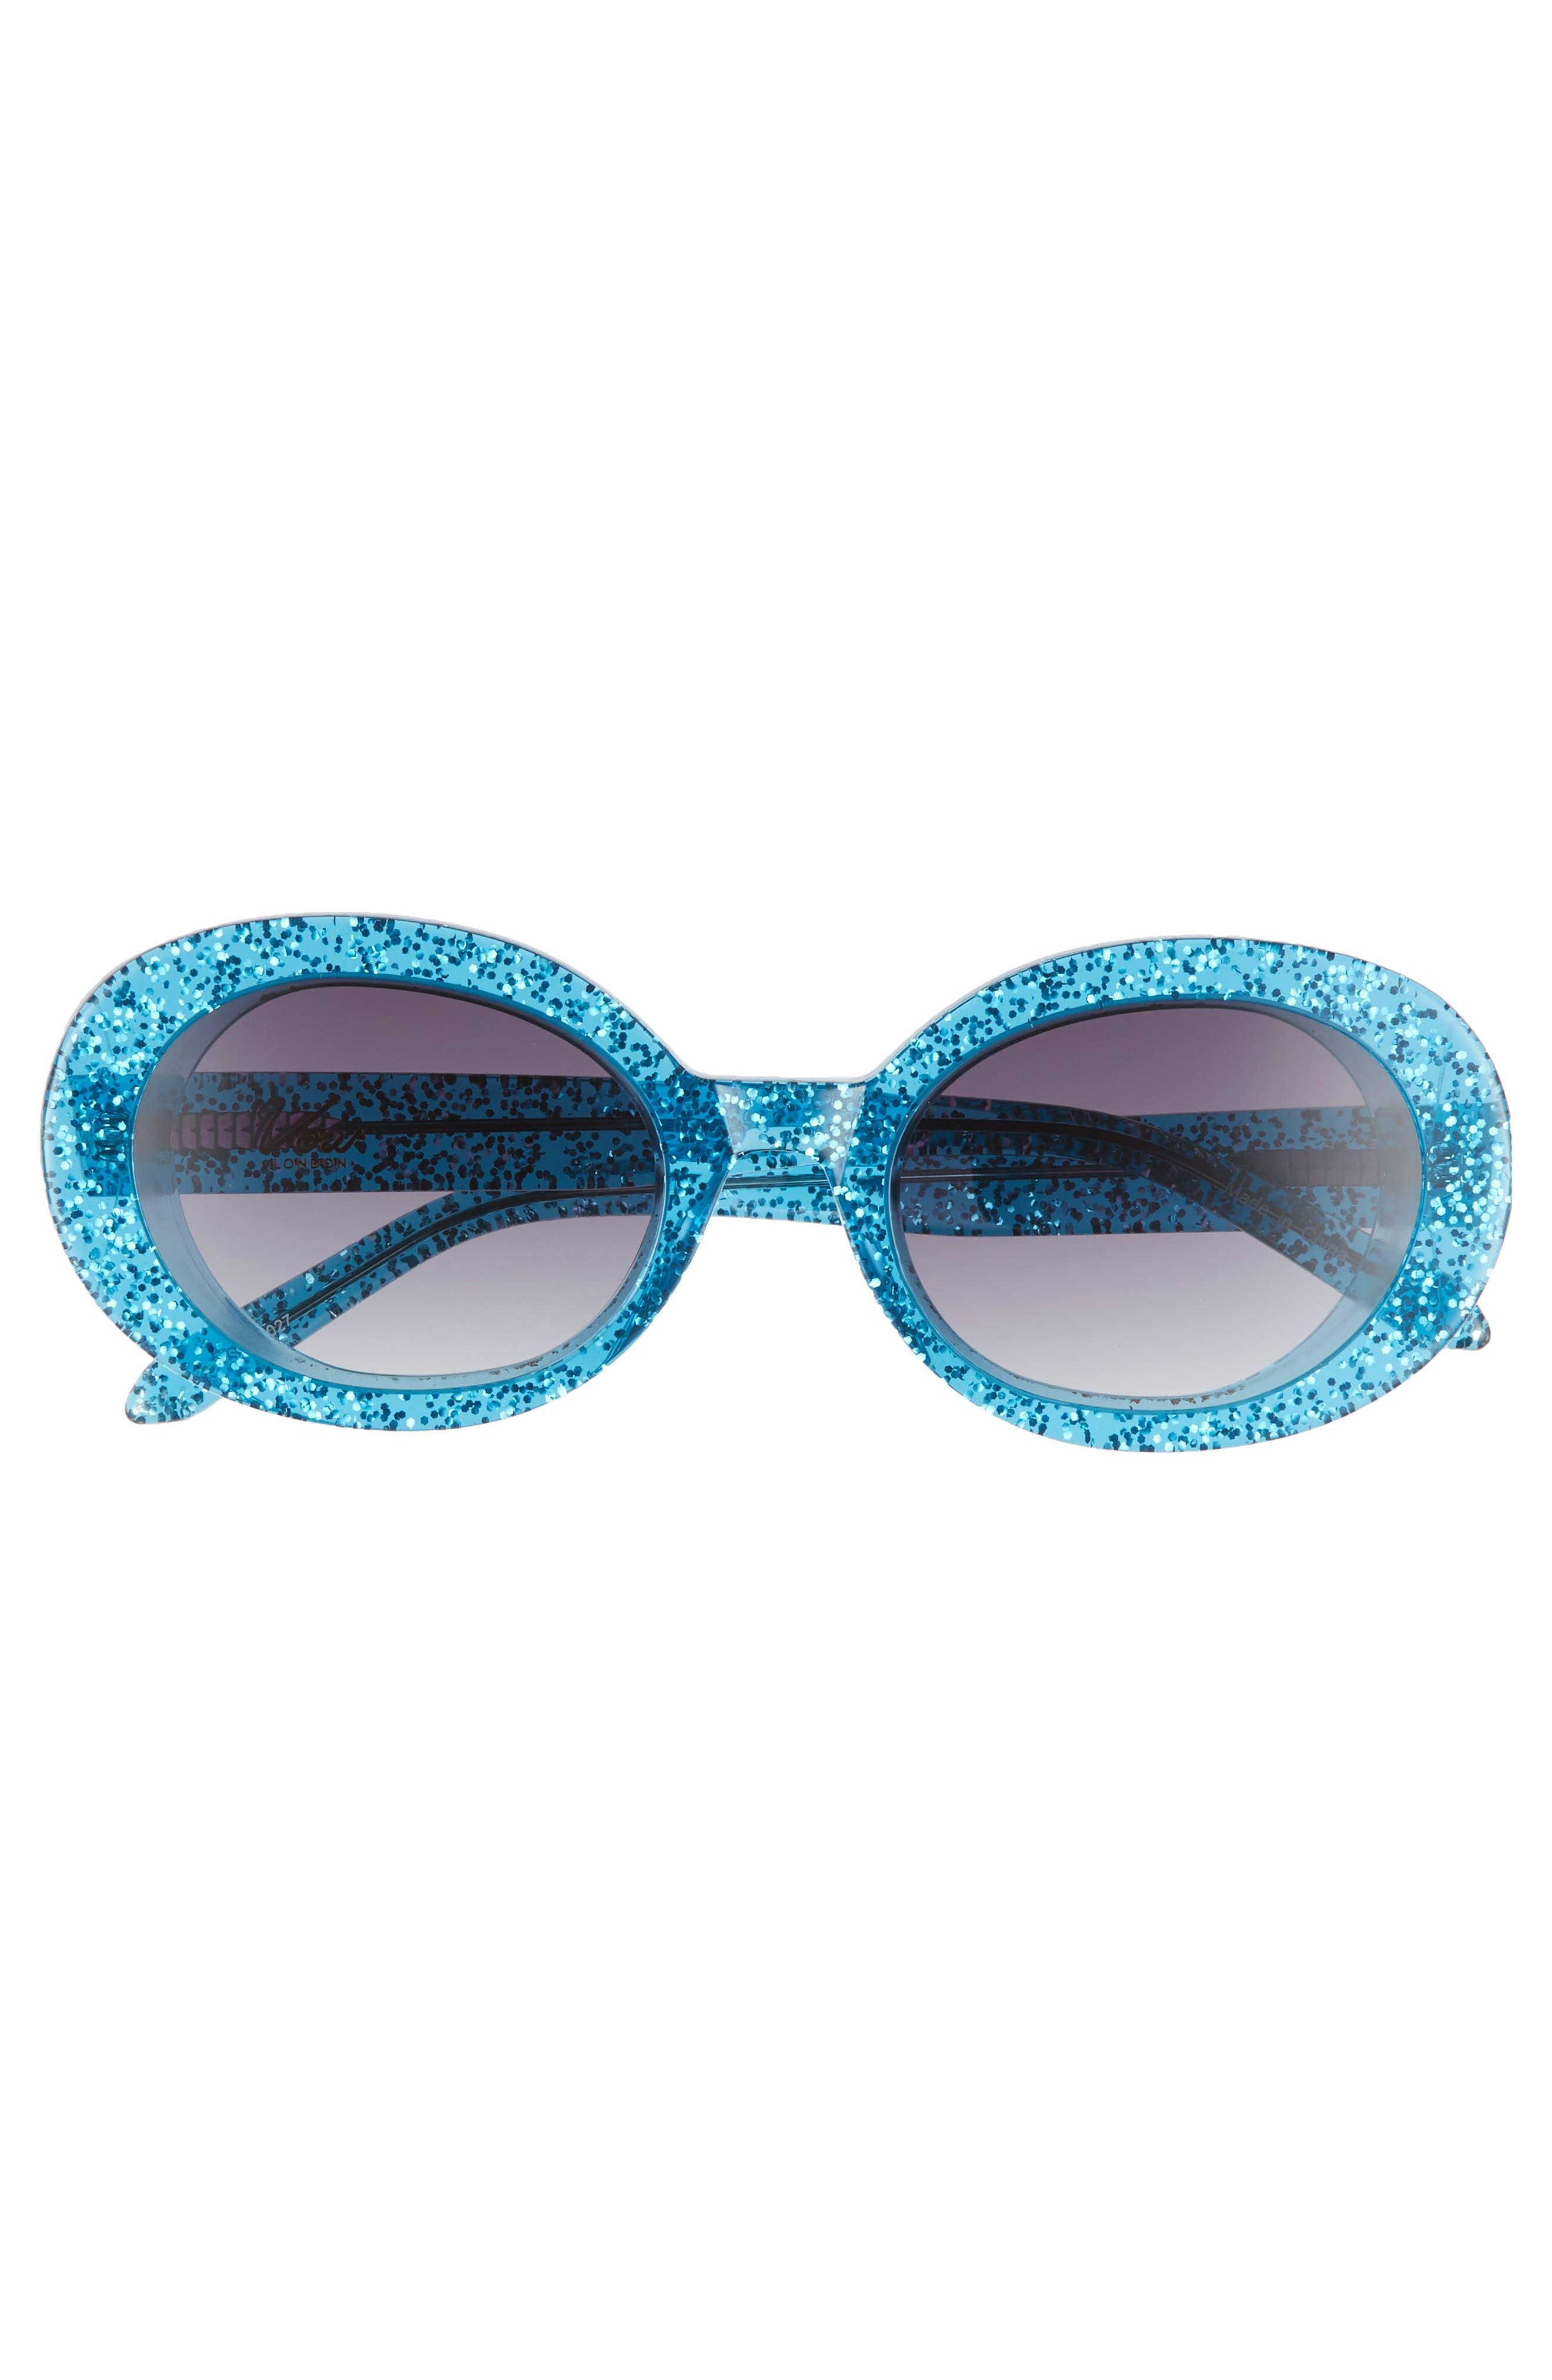 Selena 53mm Oval Sunglasses,                             Alternate thumbnail 3, color,                             BLUE GLITTER/ SMOKE